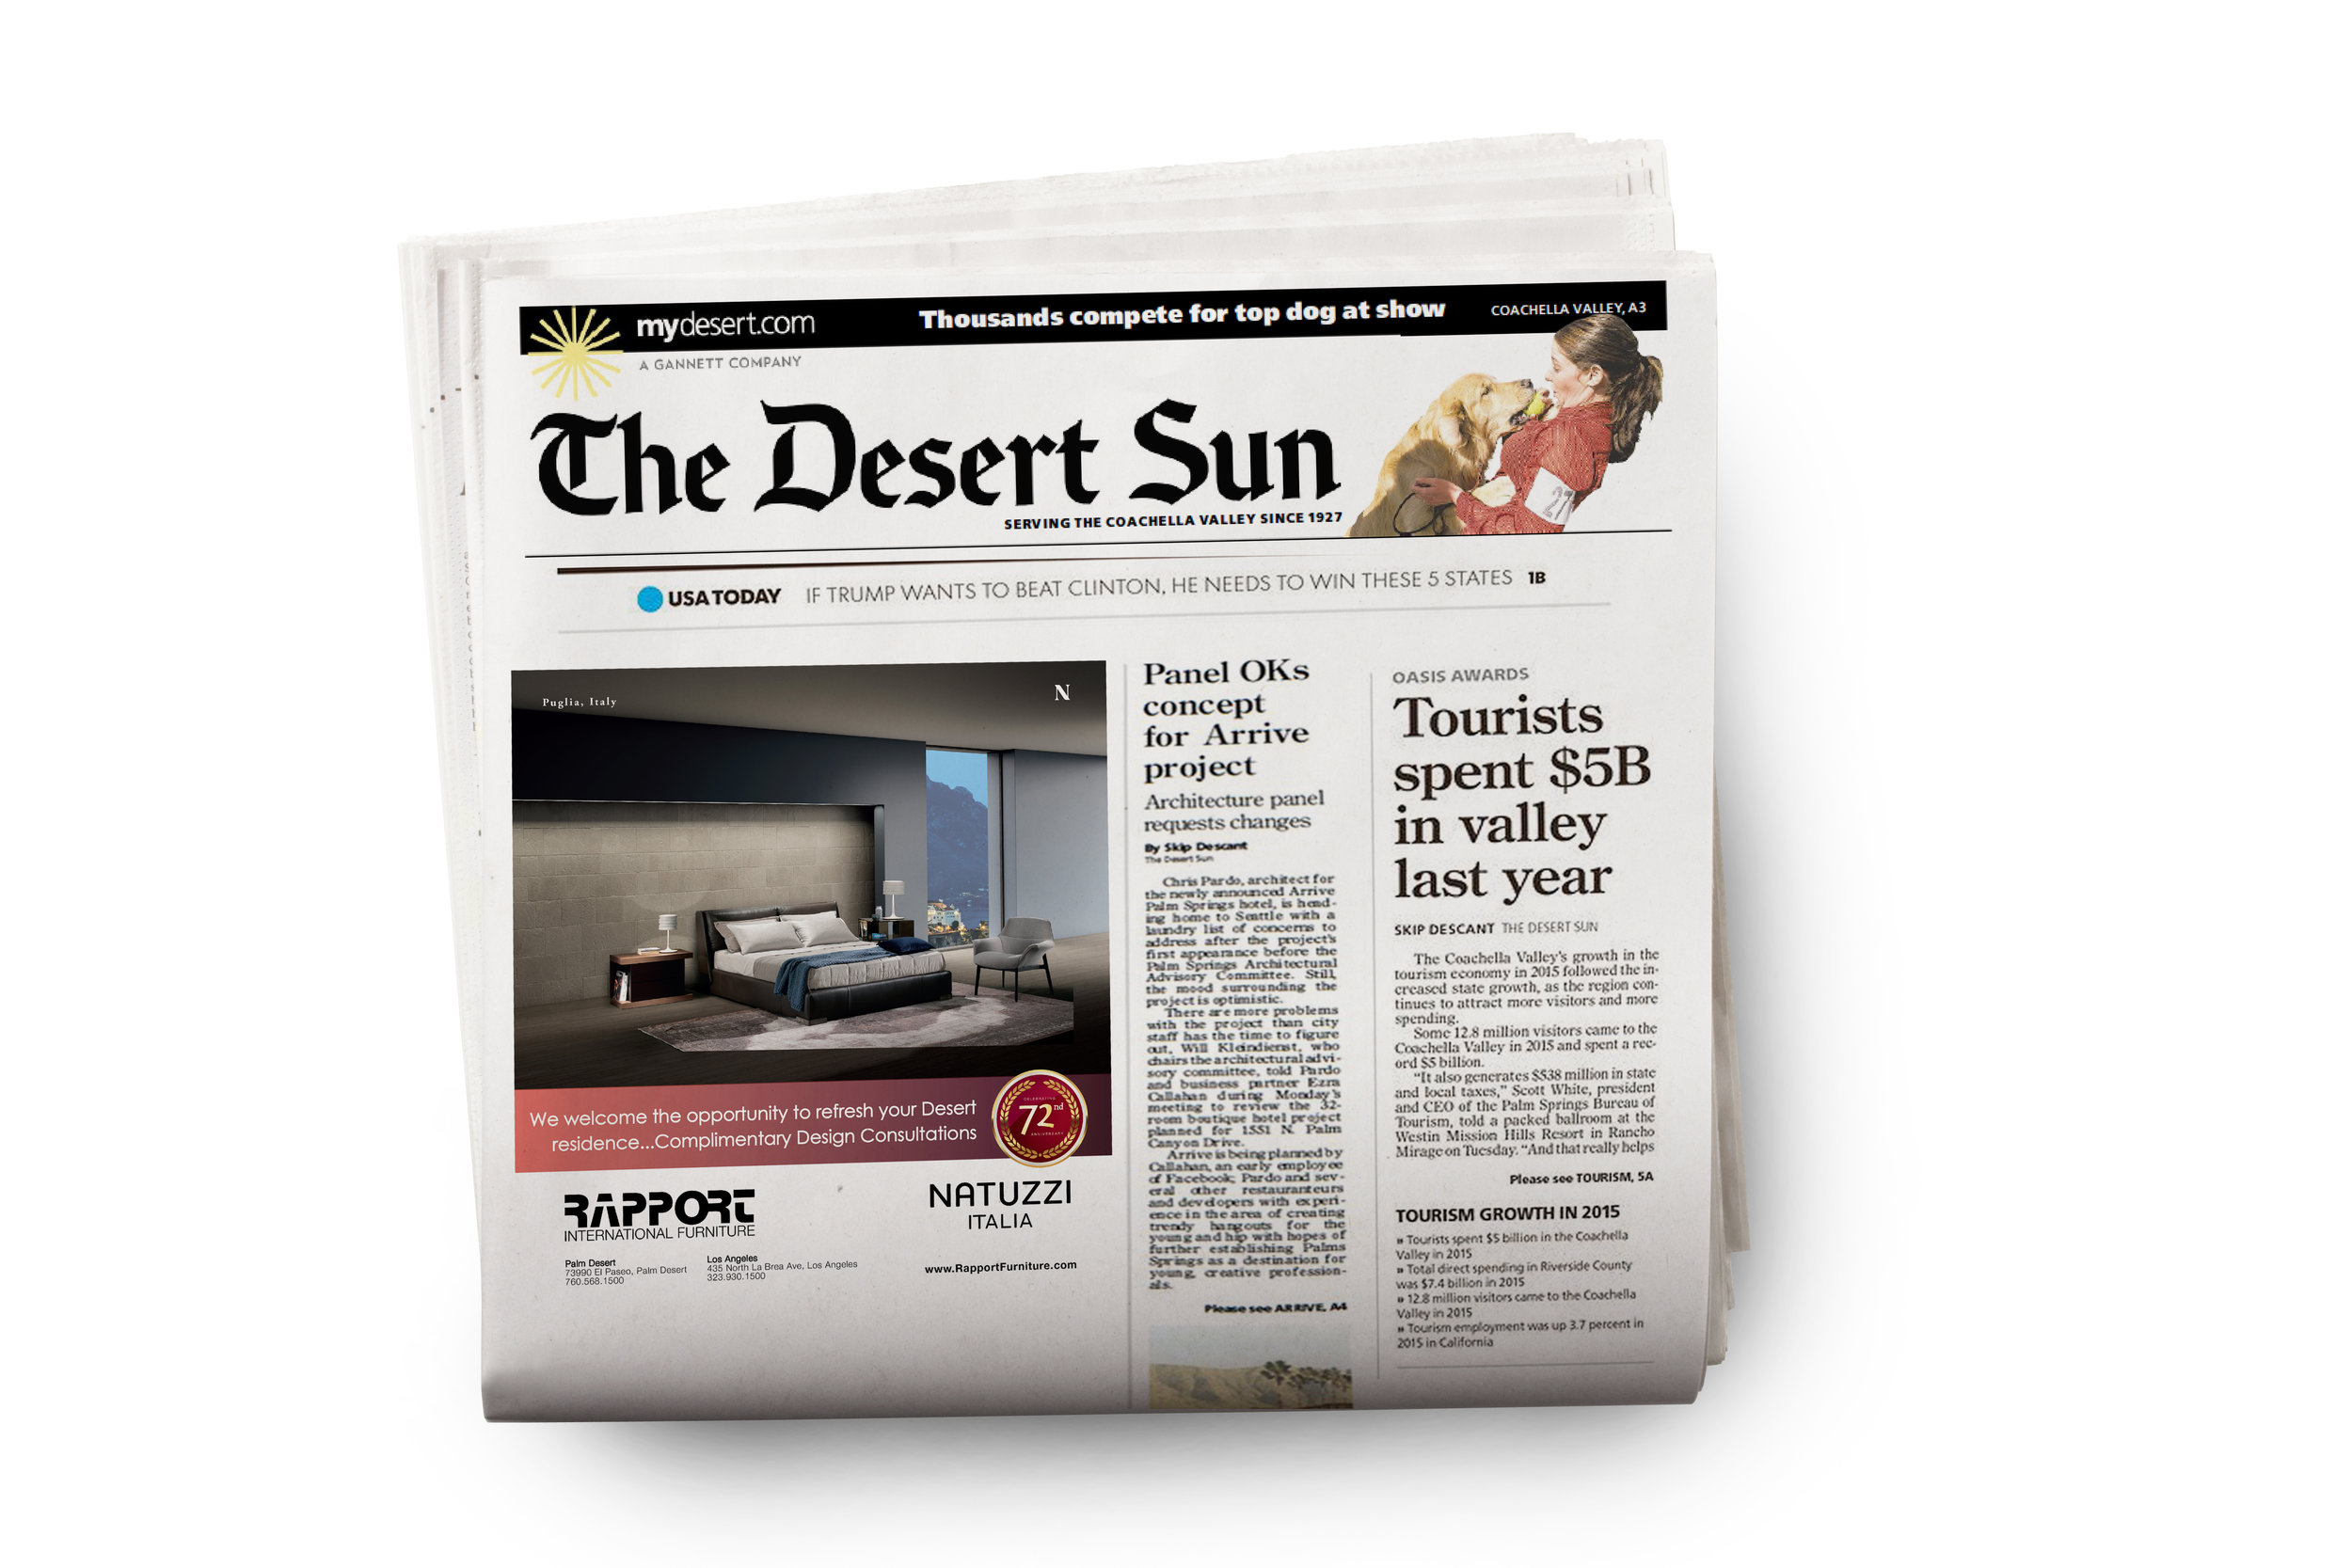 Rapport_DesertSunNewspaper_MOCKUP20.jpg